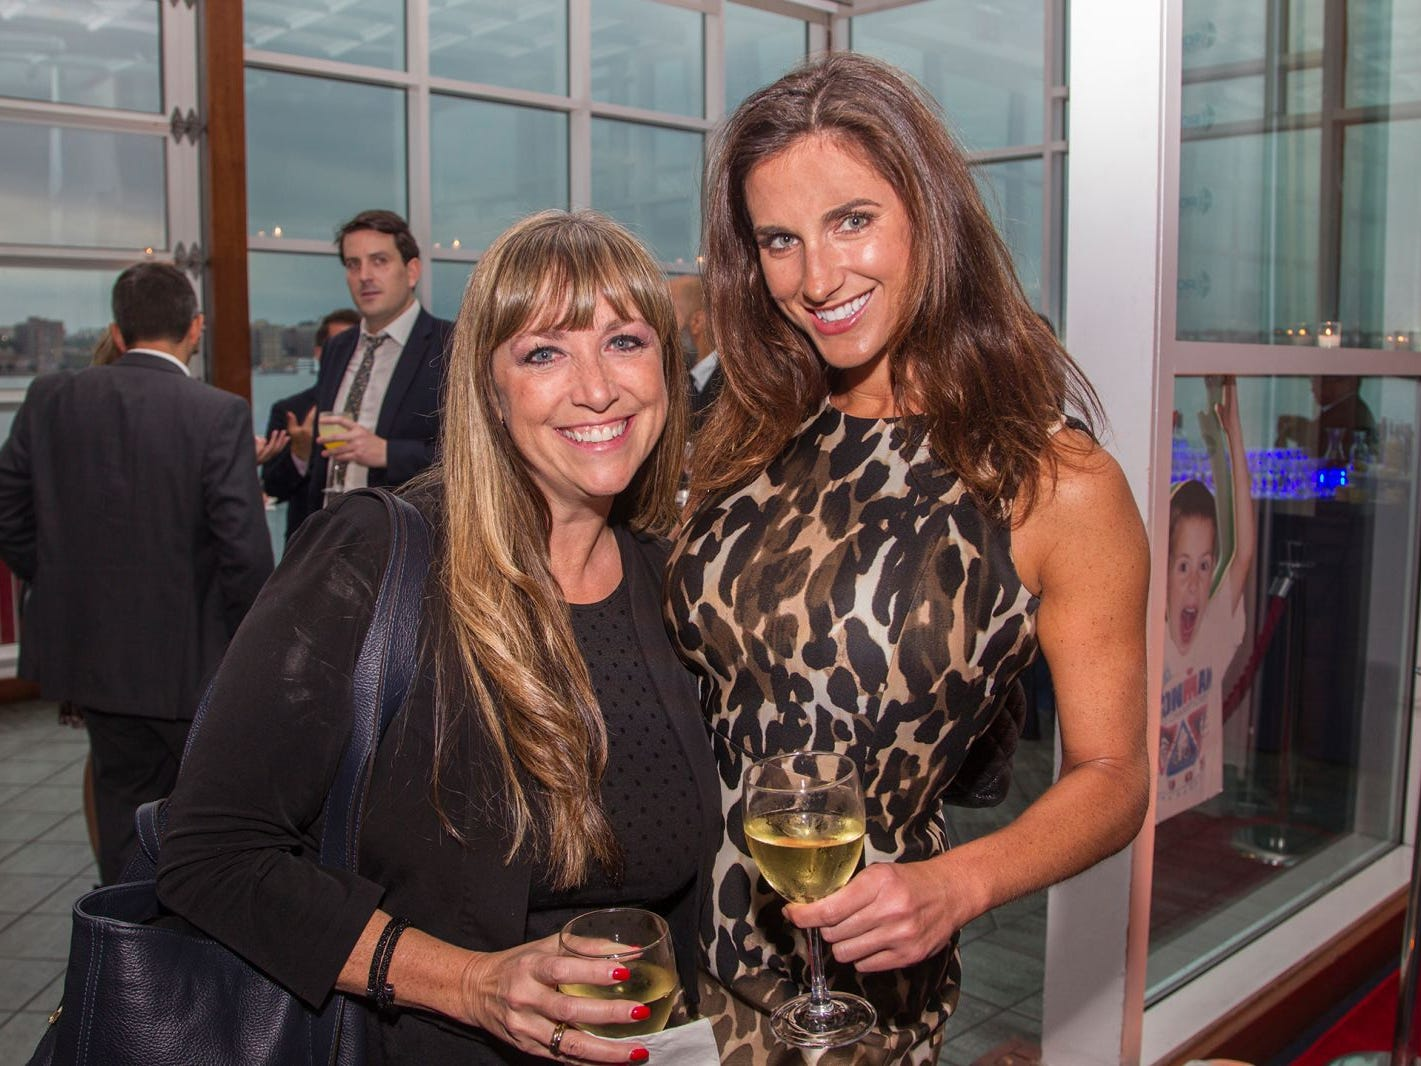 Annette Halprin, Adrienne Solti. 11th annual IronMatt Fundraiser Gala at Pier 60 Chelsea Piers. 09/20/2018